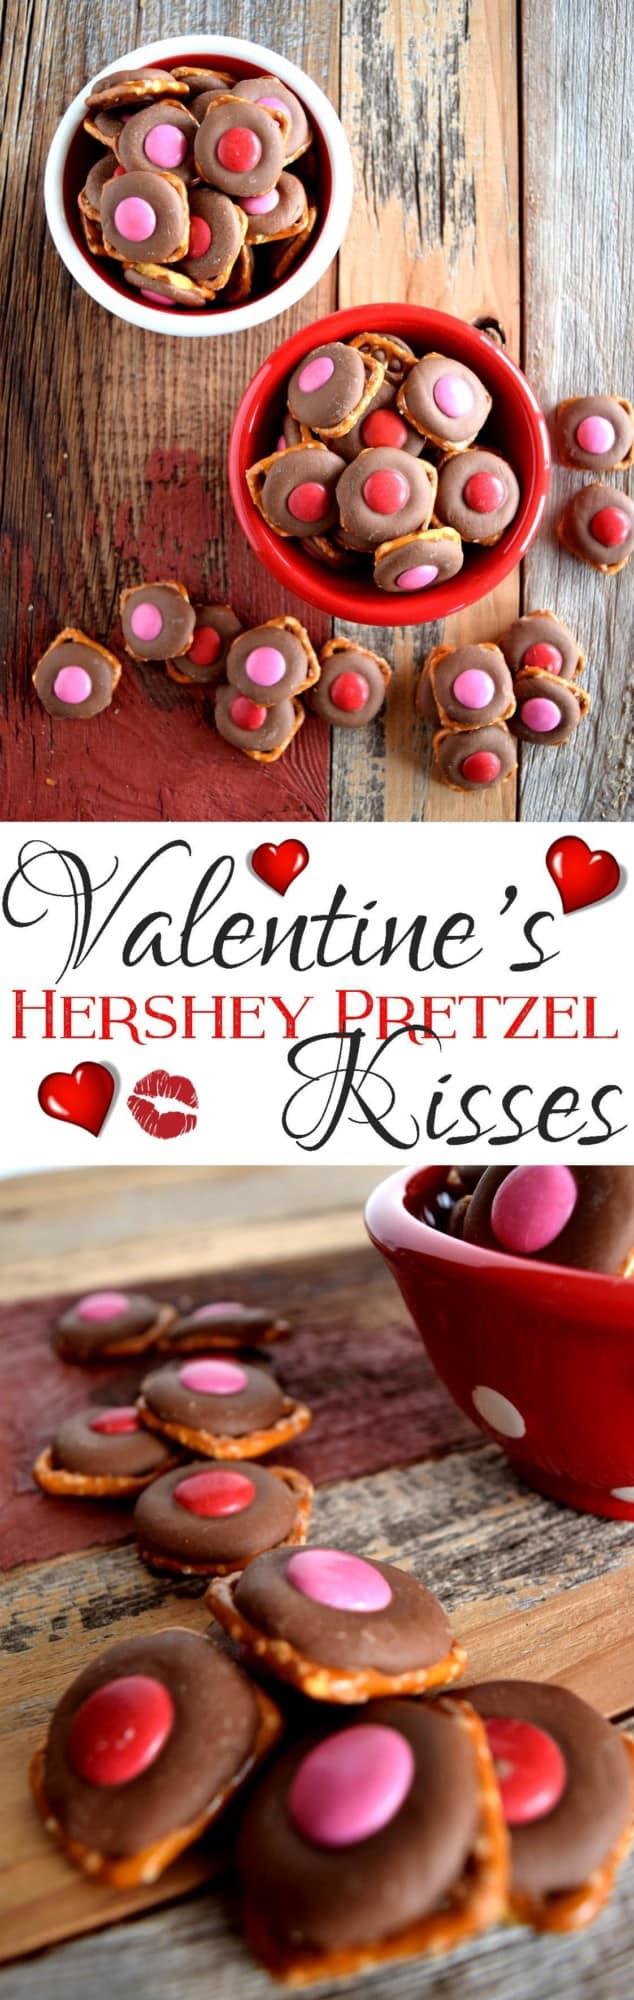 Valentine's Hershey Pretzel Kisses